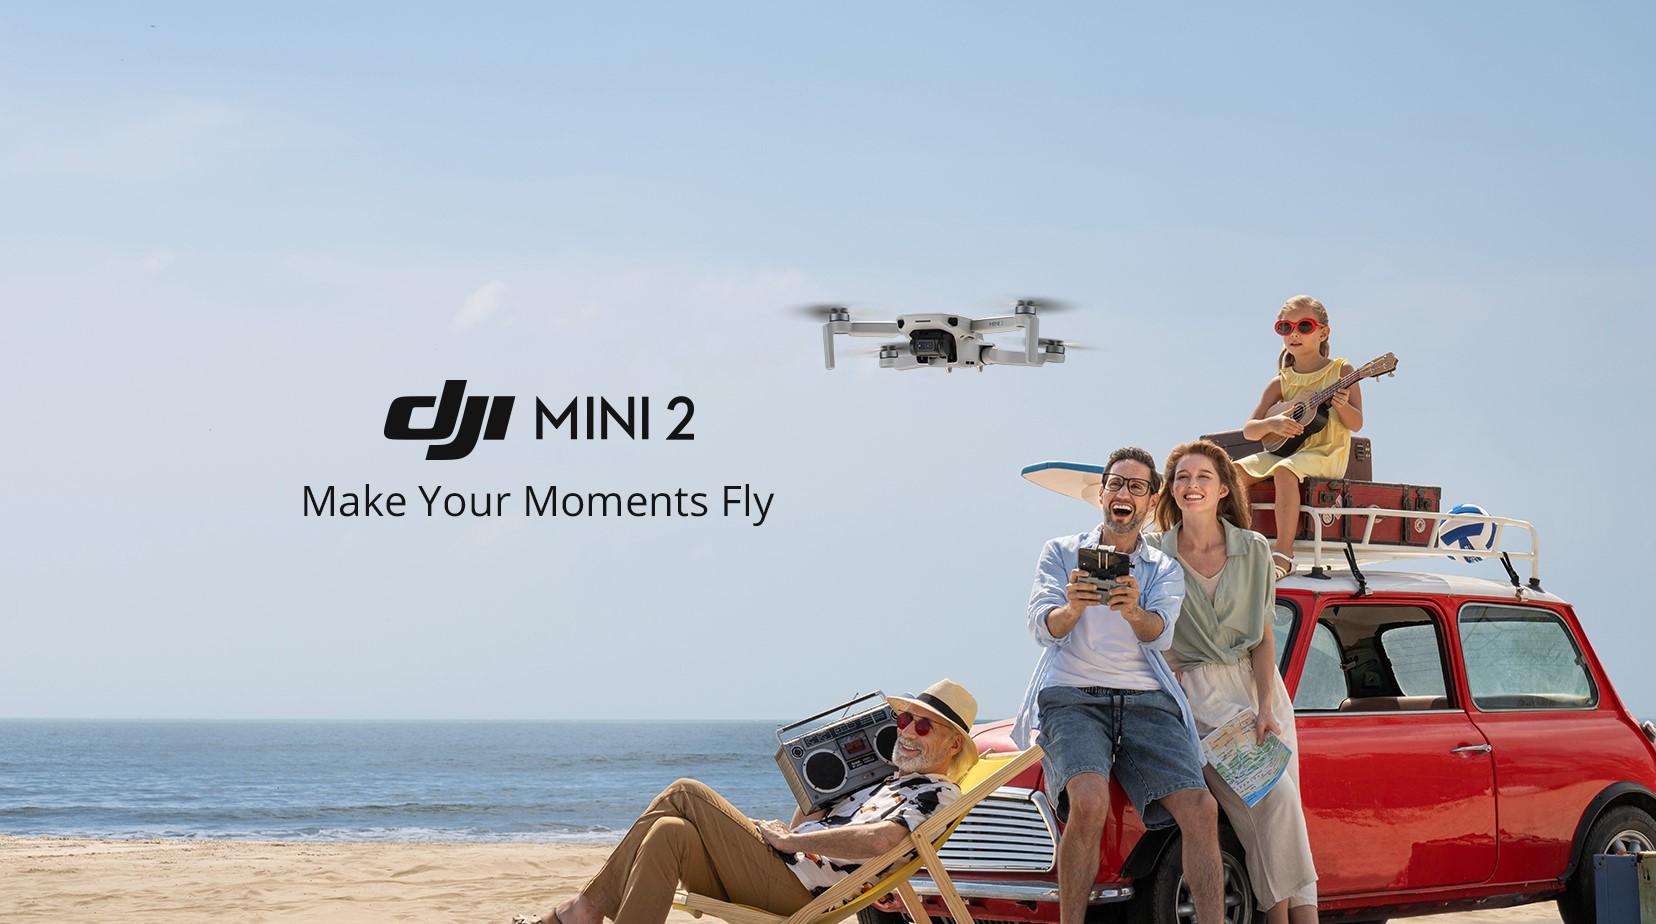 DJI Global Header Image